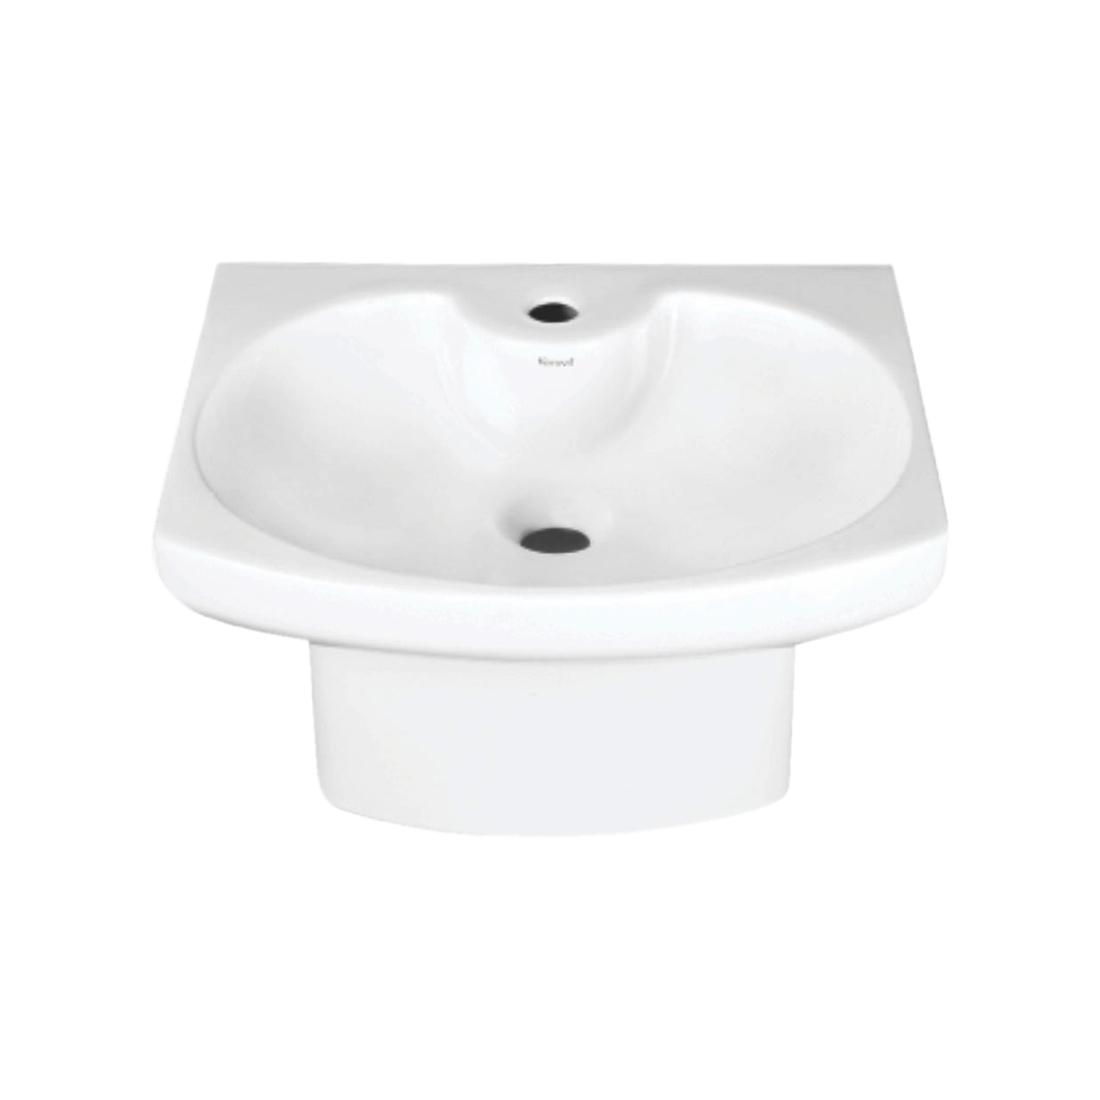 Kerovit Drake KS258 Wash Basin With Integrated Half Pedestal